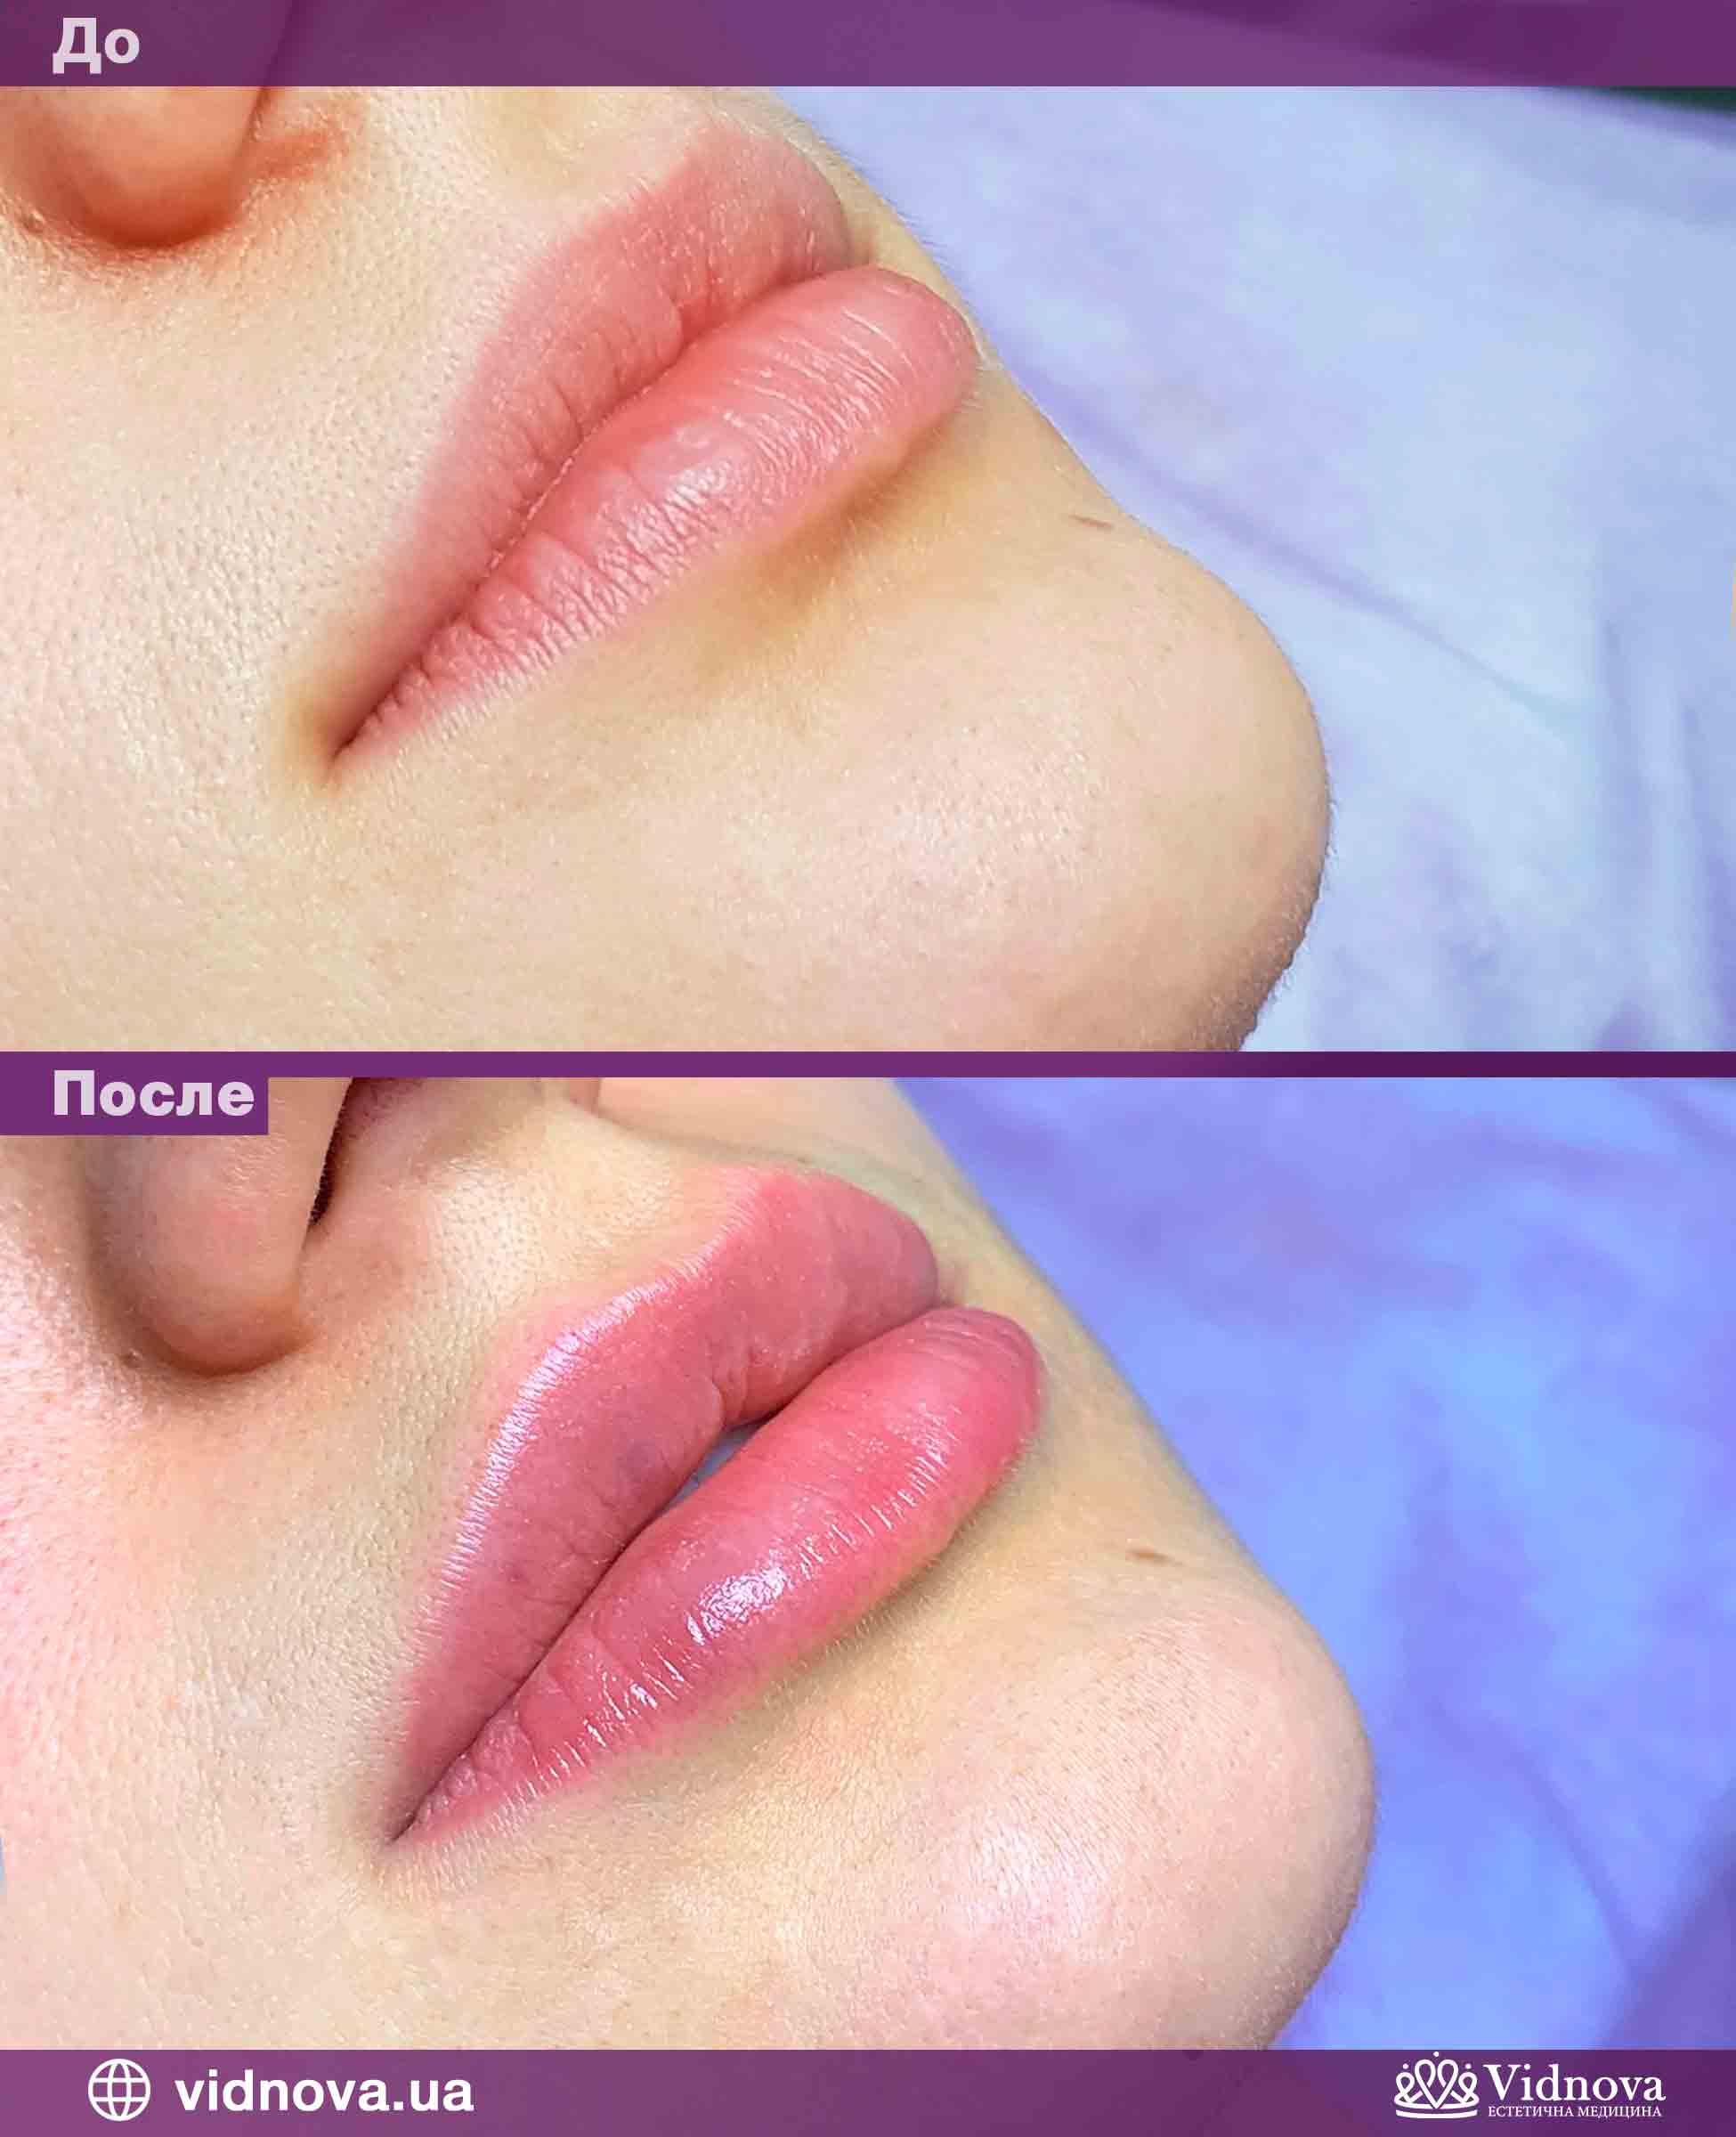 Увеличение губ: Фото До и После - Пример №6-2 - Клиника Vidnova